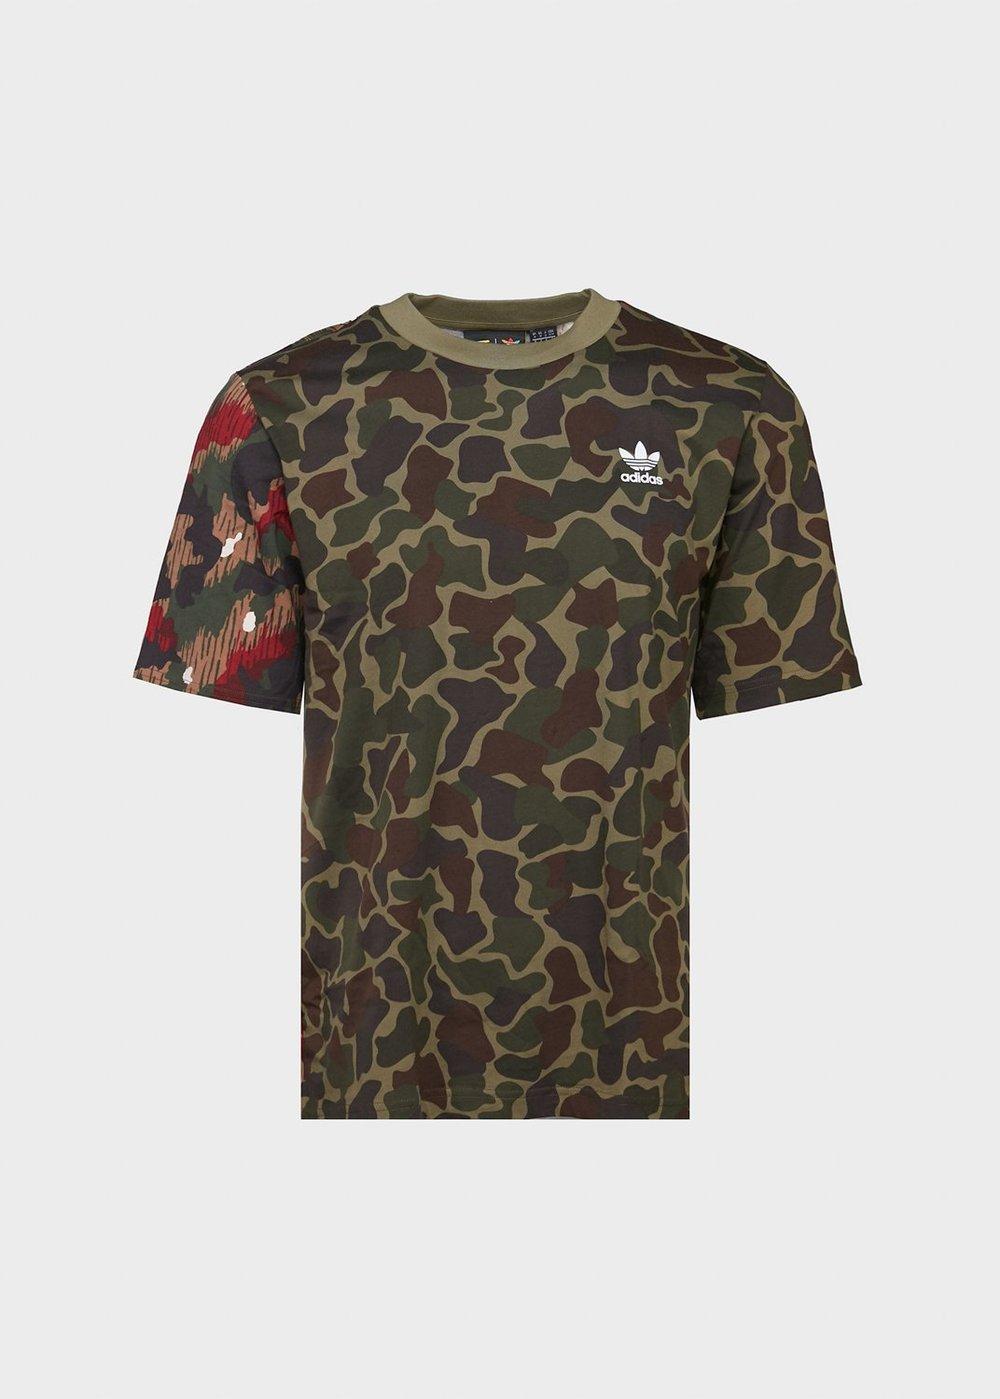 4. Pharrell Williams HU Hiking Tee - Brand: AdidasPrice: $50.00